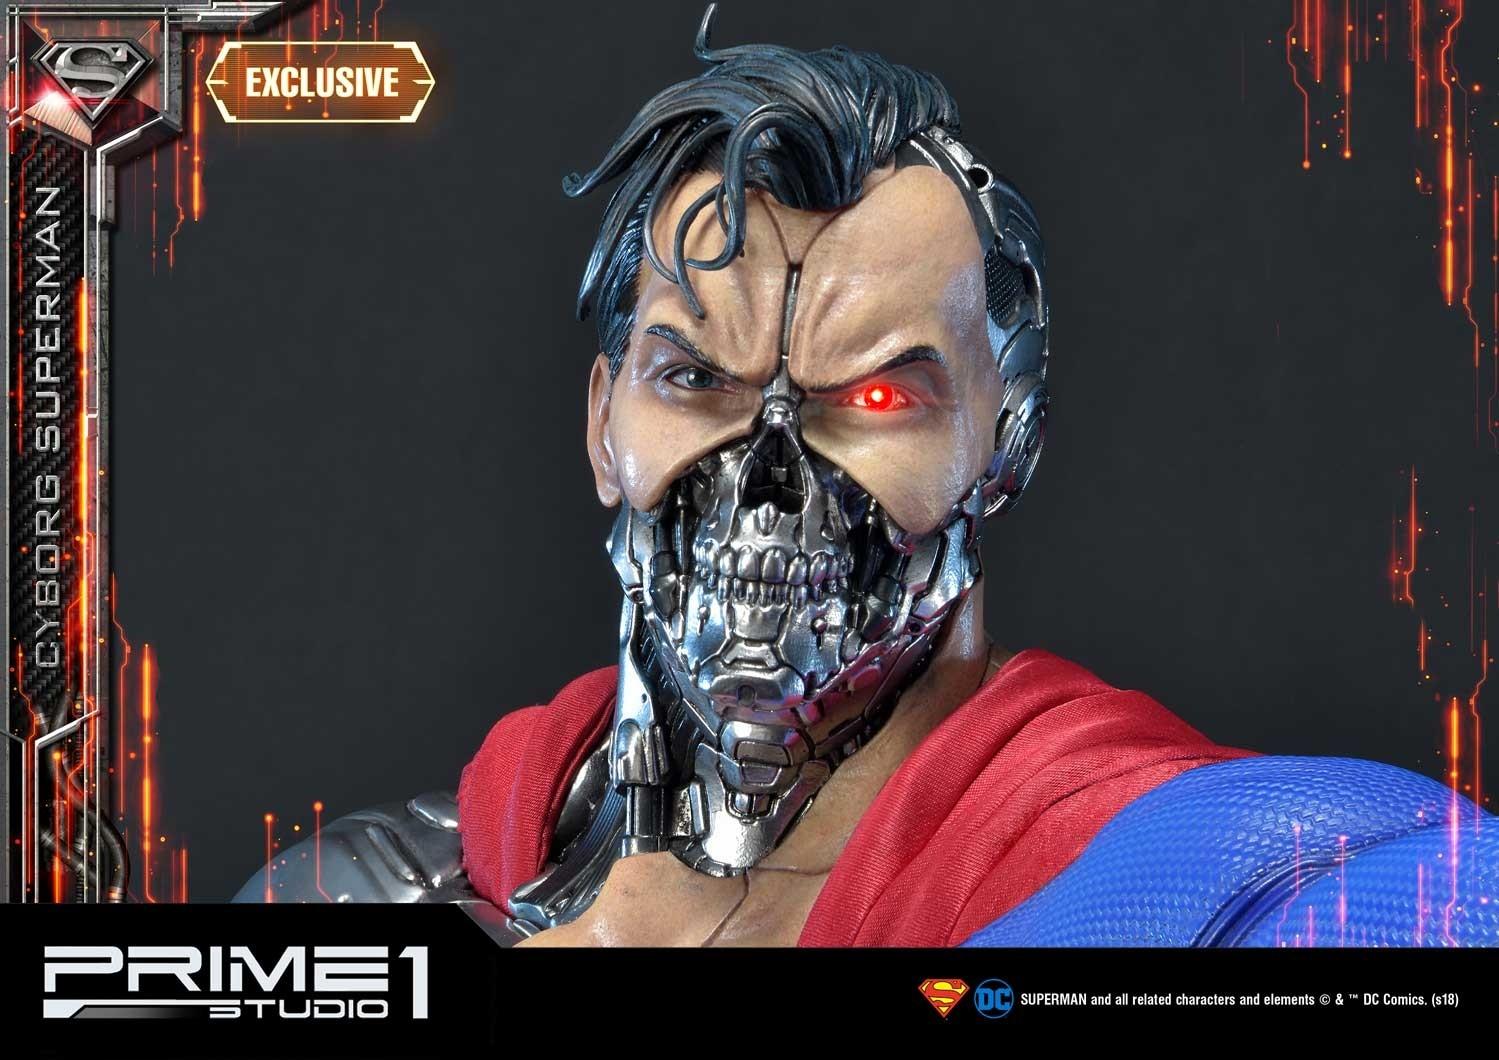 Link a Prime-1-Cyborg-Superman-Statue-020